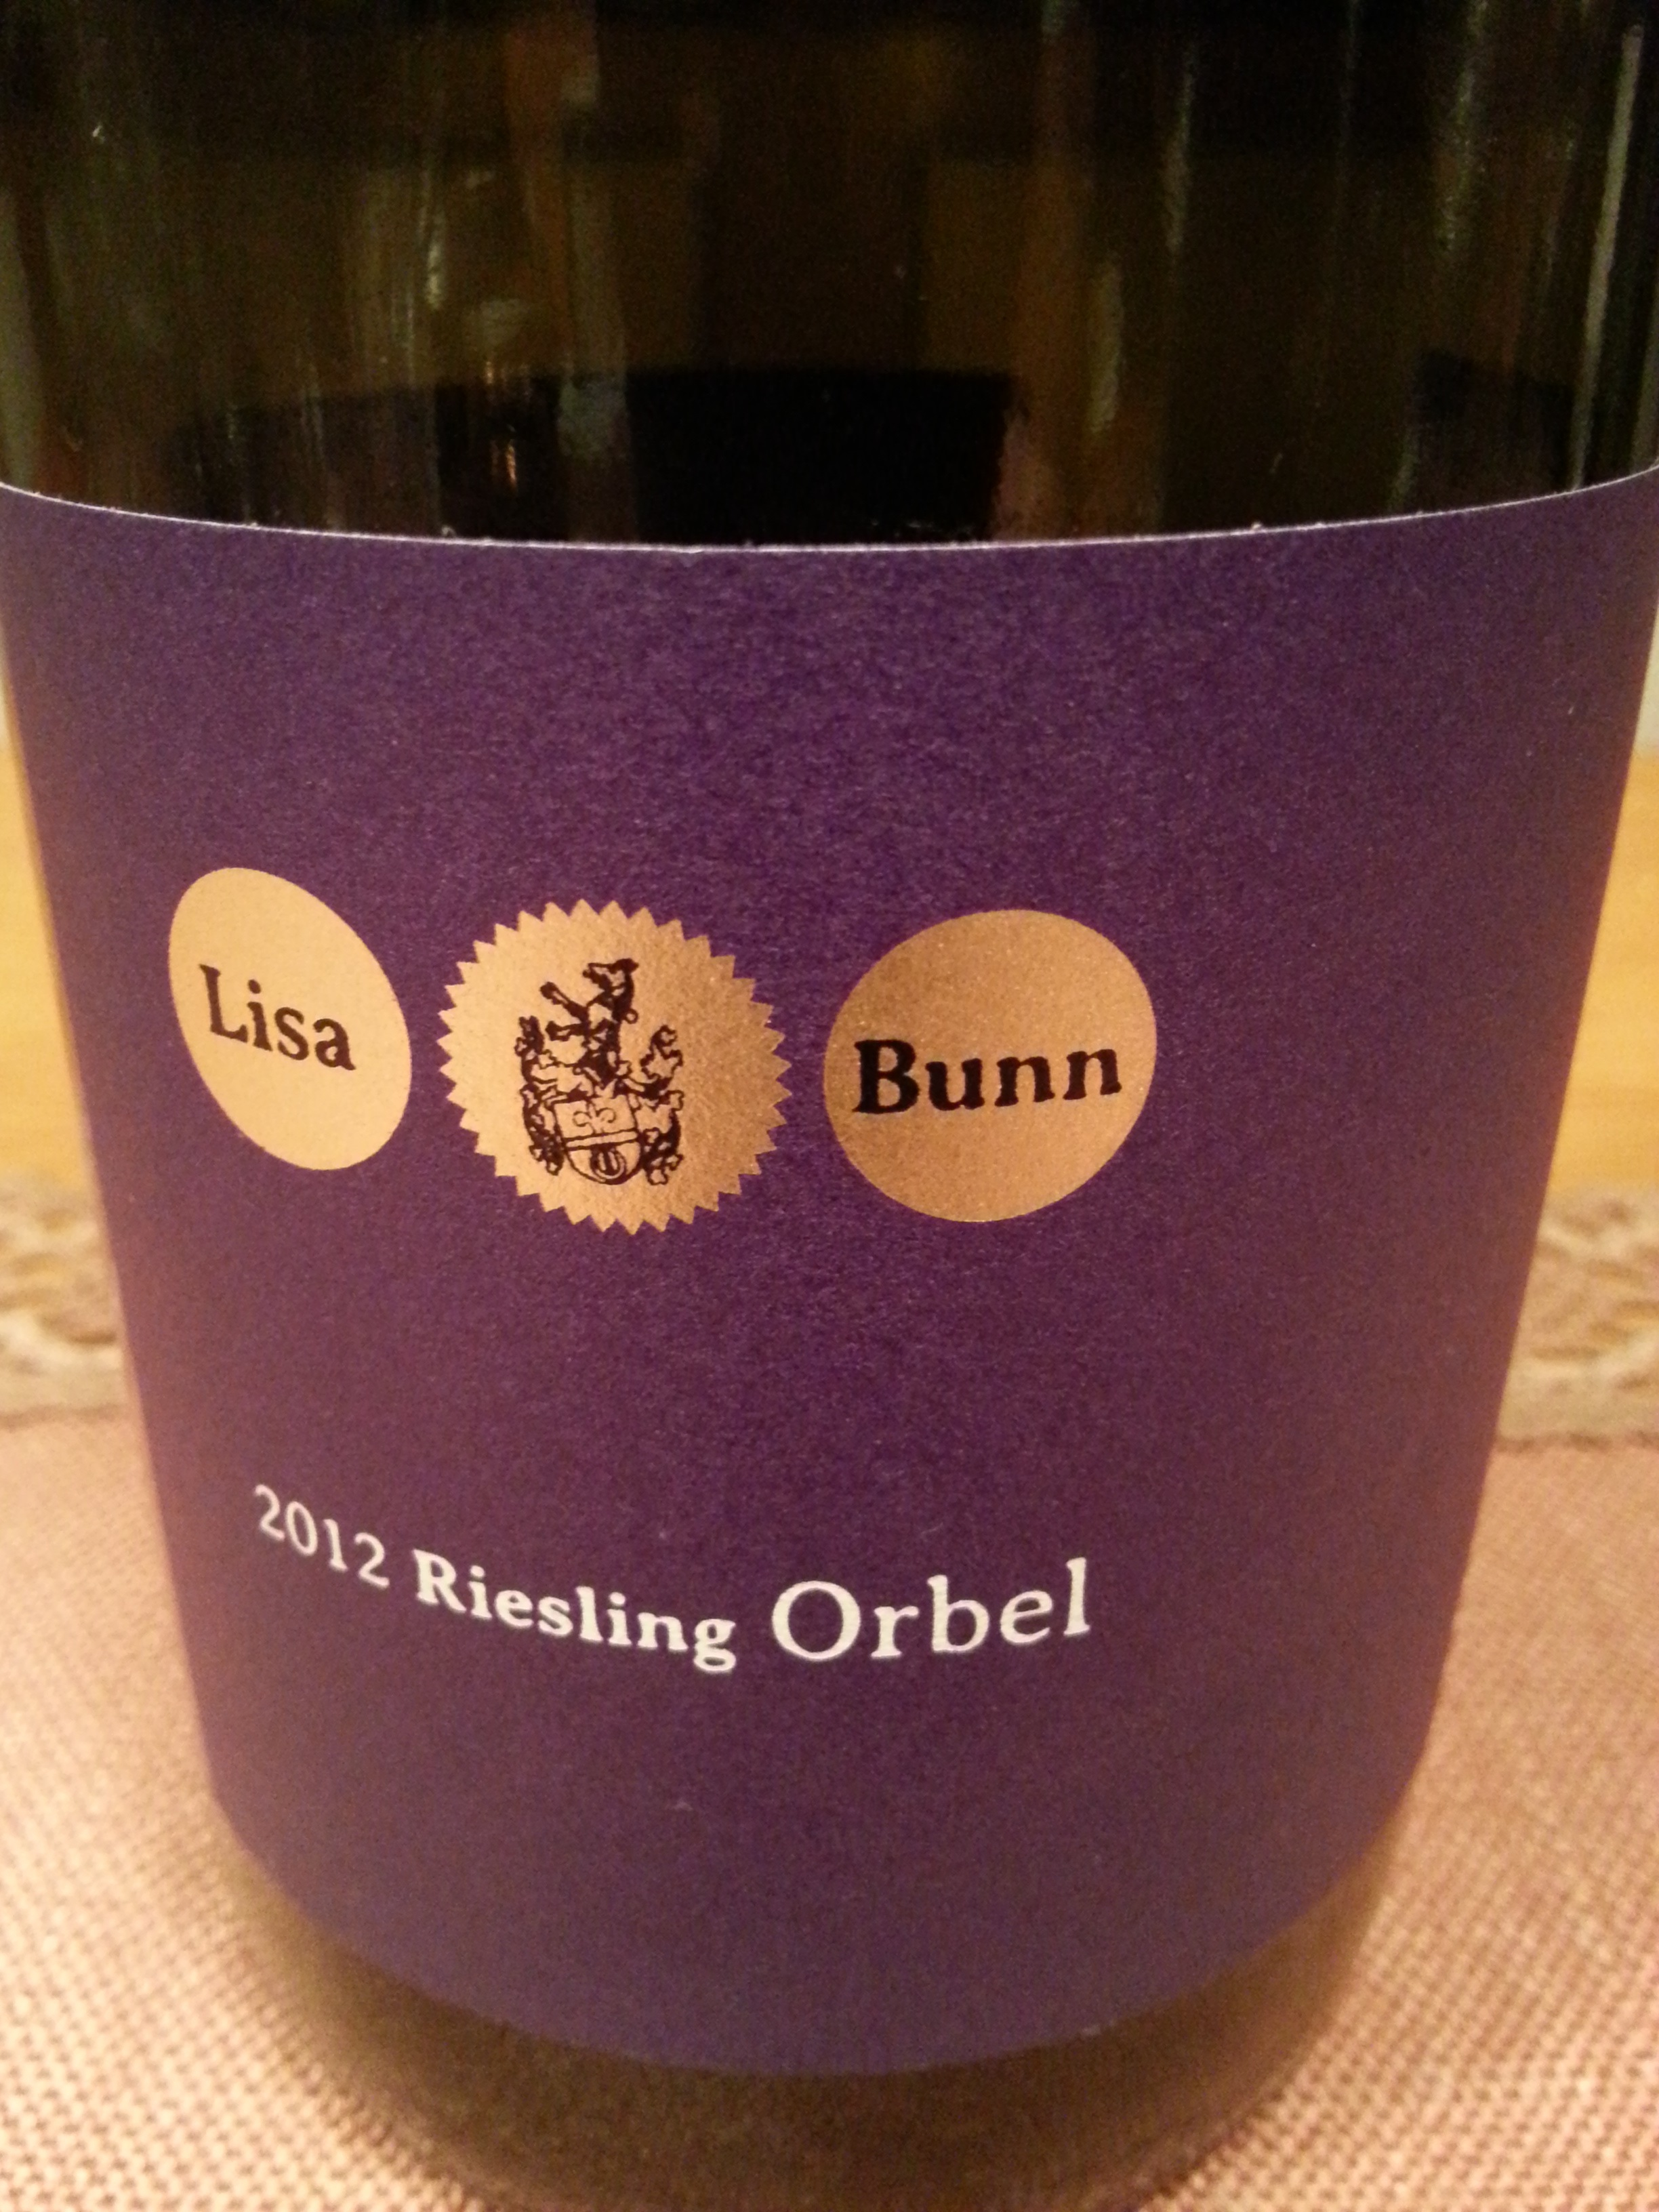 2012 Riesling Orbel | Bunn